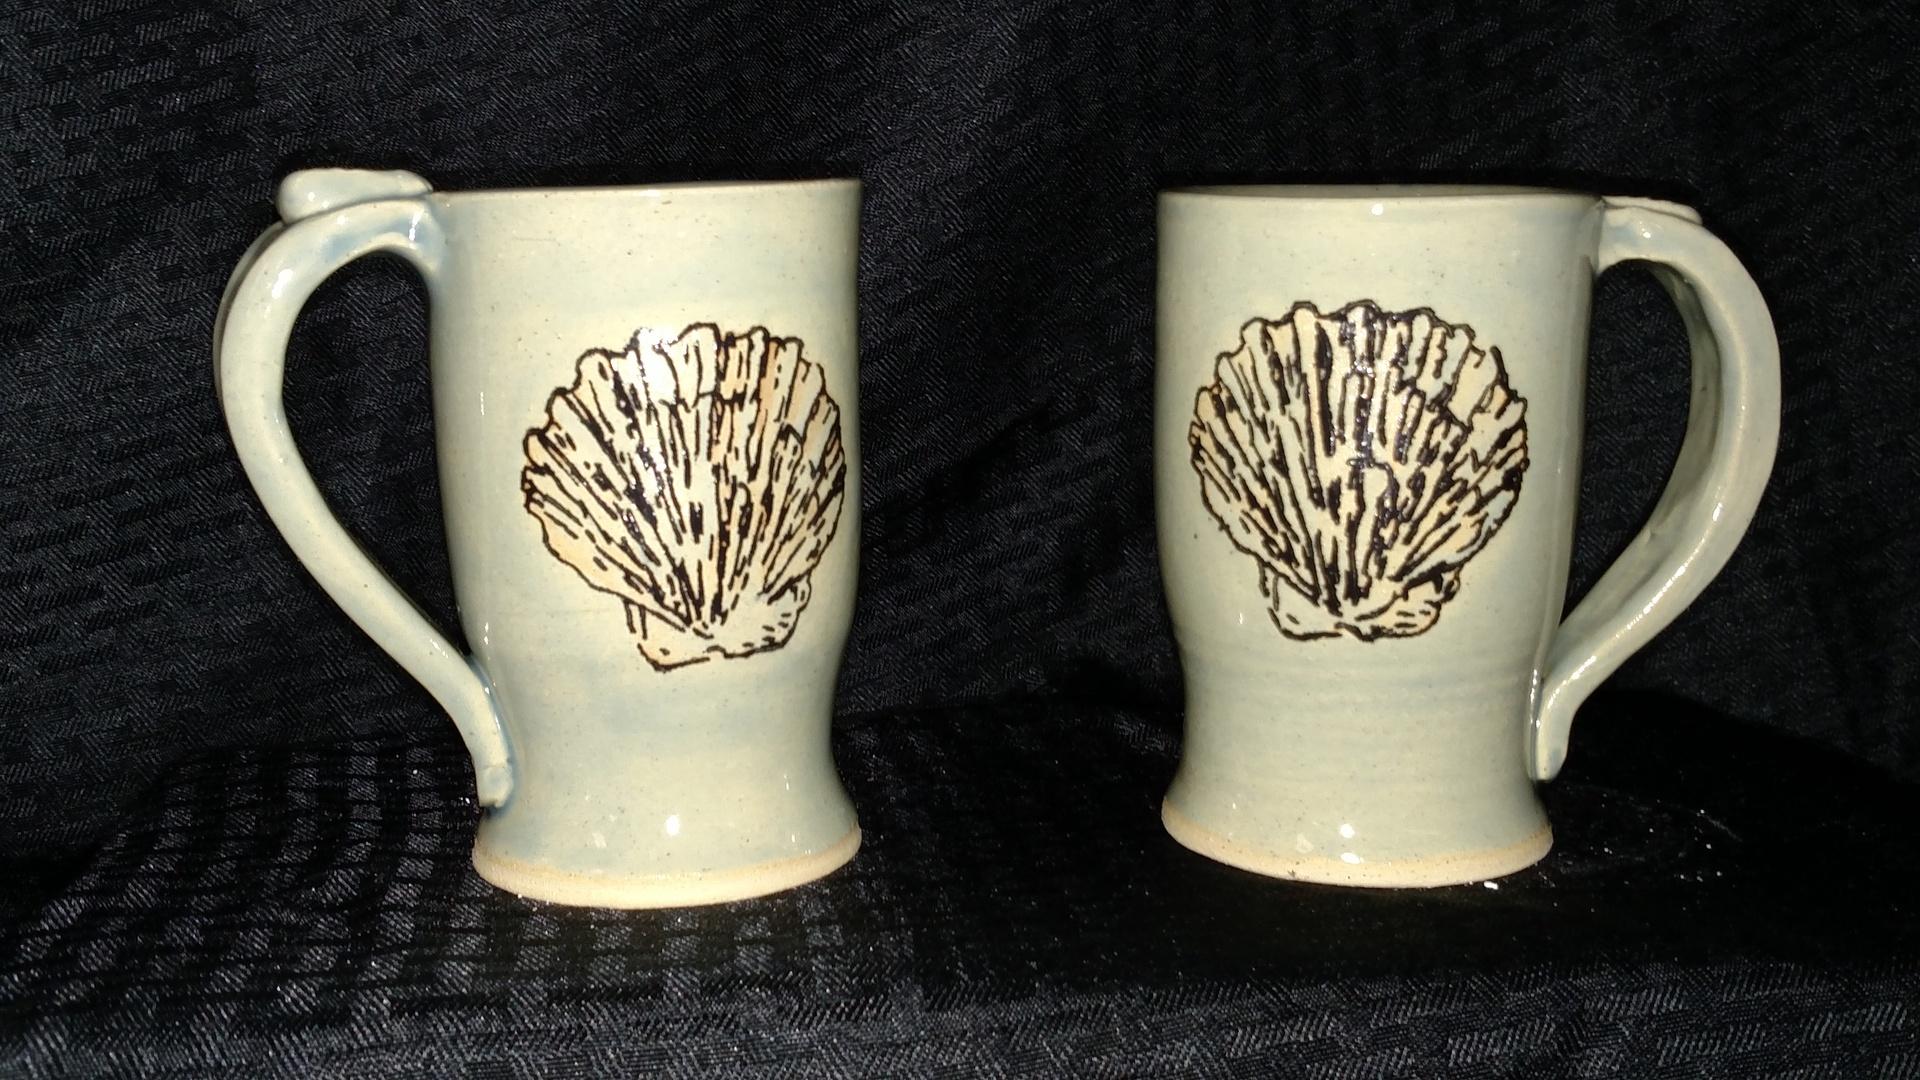 Stoneware mugs with seashells